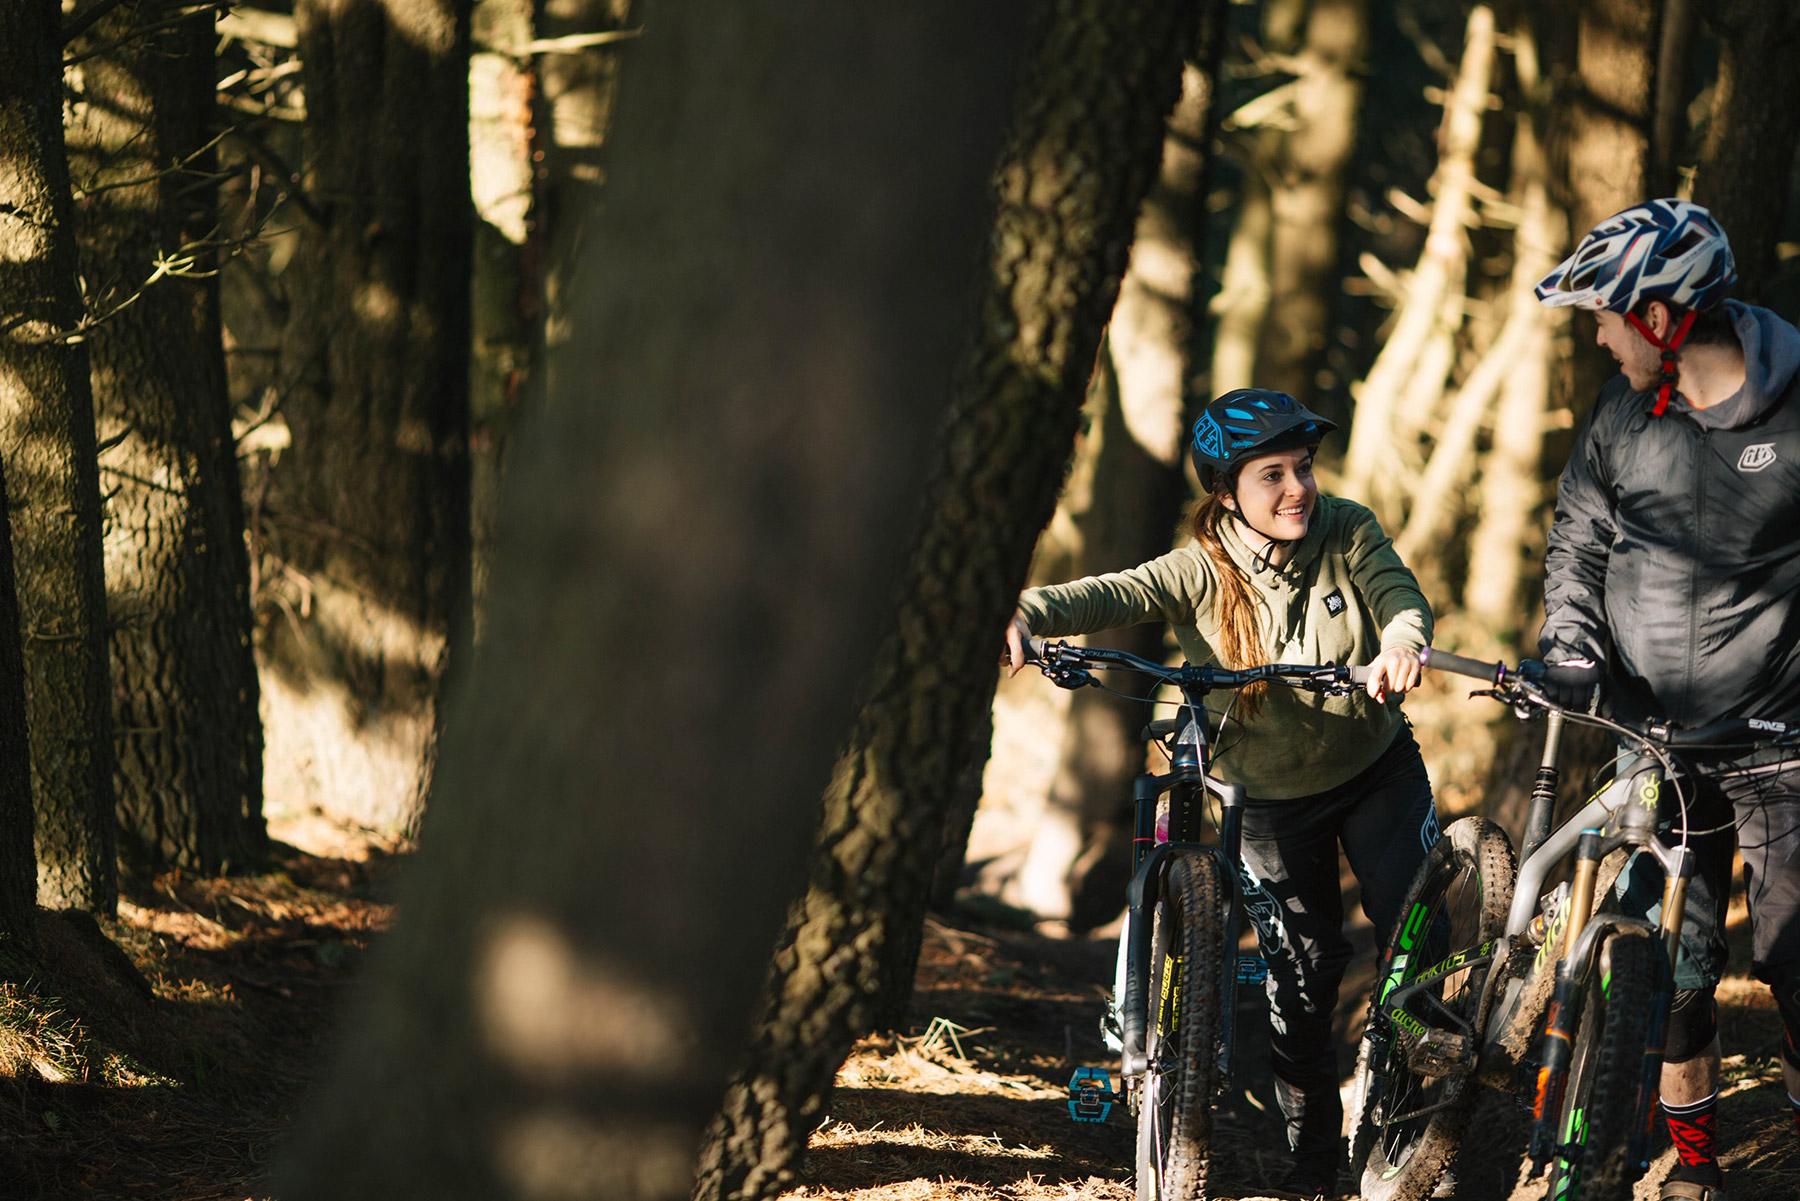 Veronique Sandler at Tirpentwys Trails